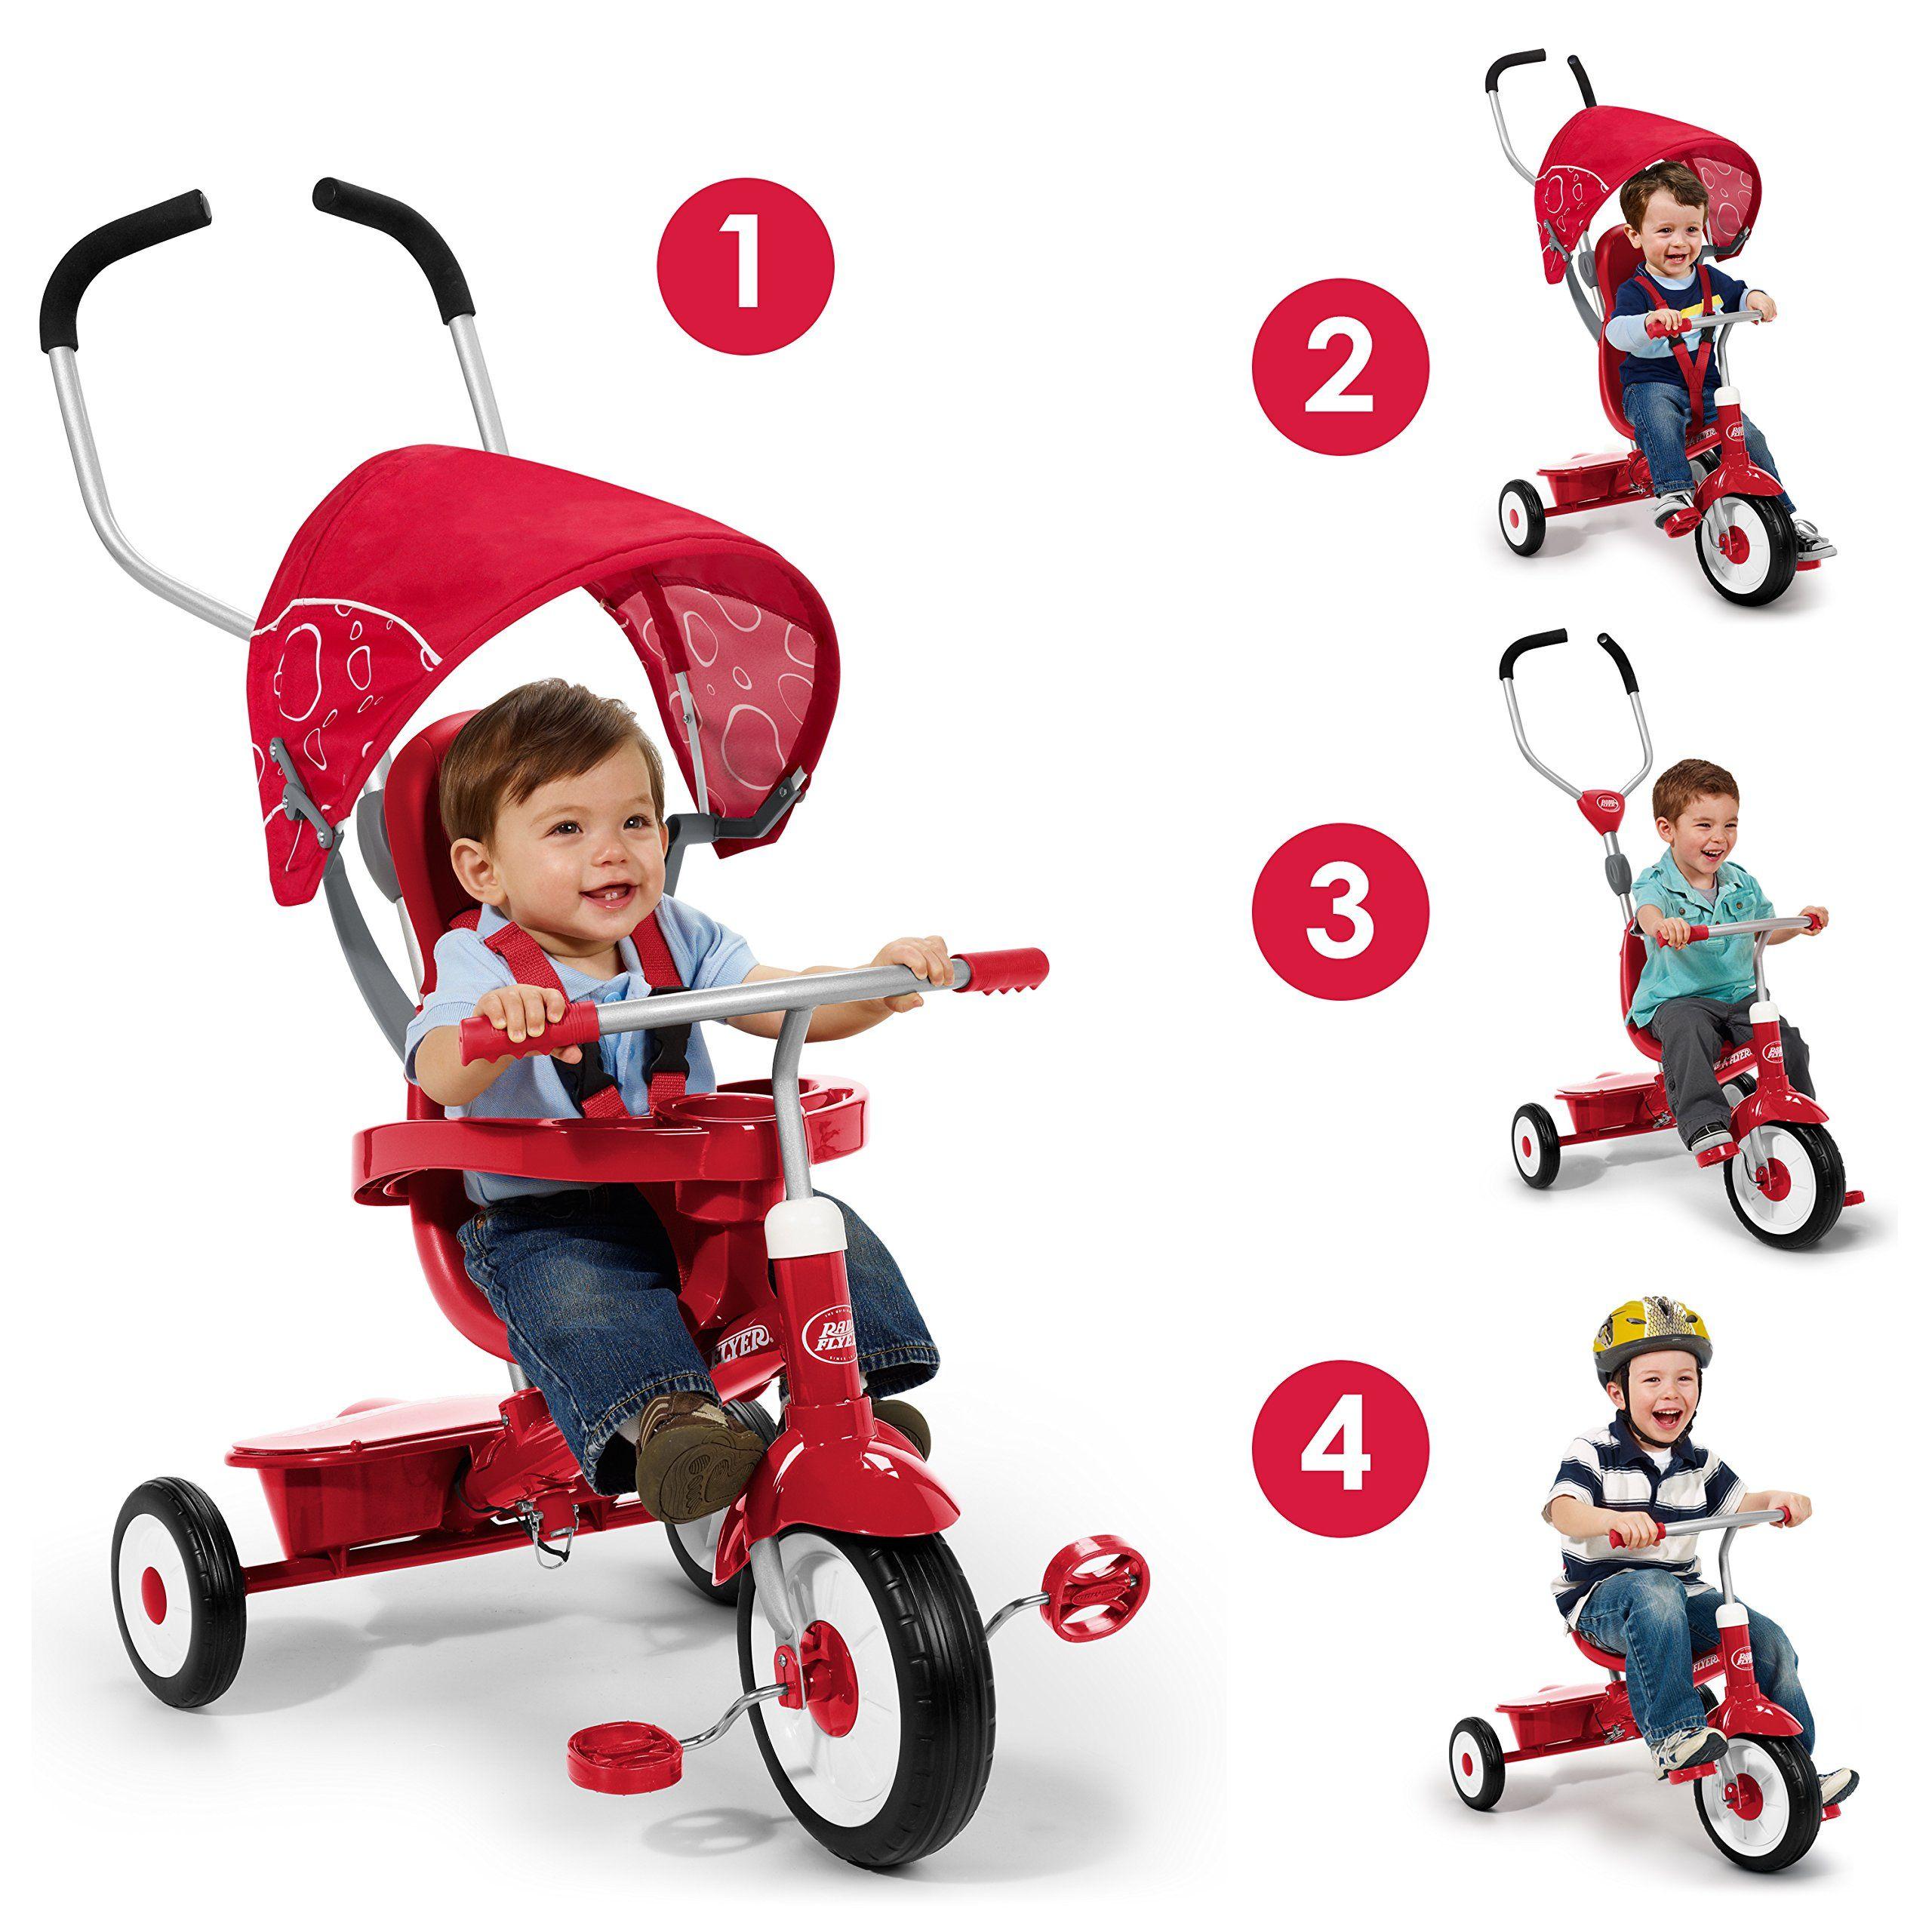 Leina Amazon Com Radio Flyer 4 In 1 Trike Red Toys Games